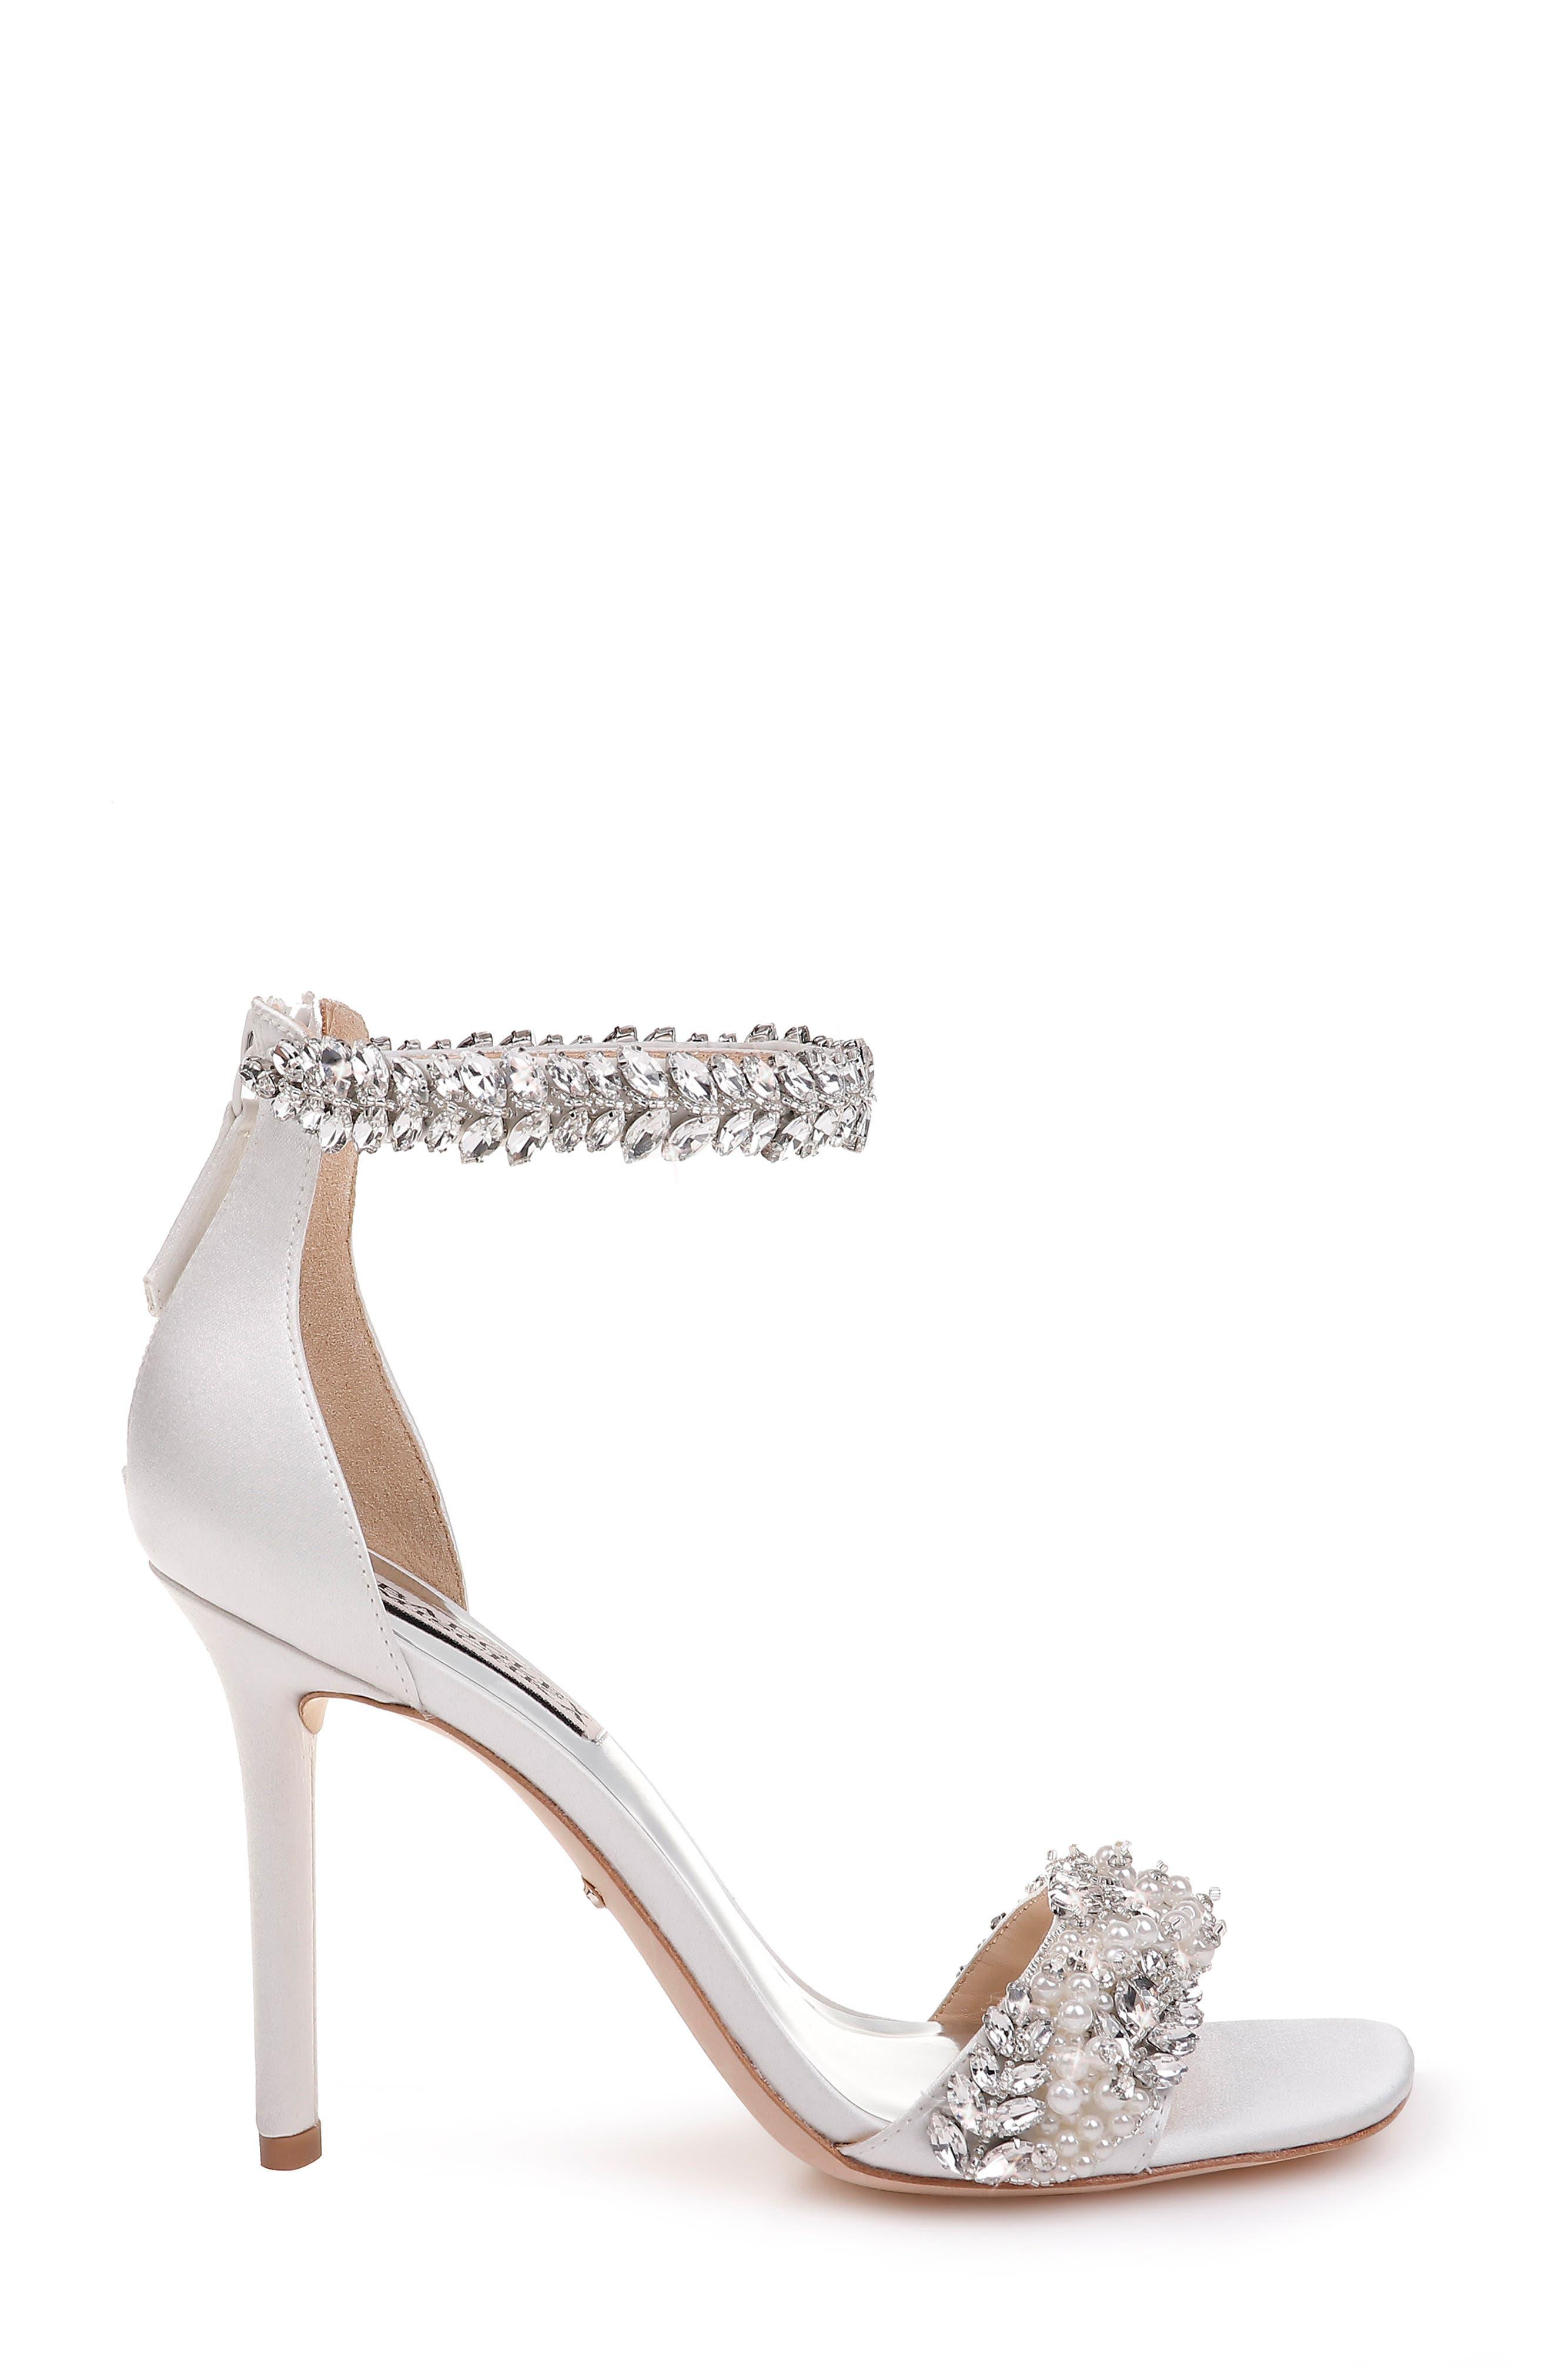 BADGLEY MISCHKA COLLECTION, Badgley Mischka Fiorenza Crystal & Imitation Pearl Embellished Sandal, Alternate thumbnail 3, color, SOFT WHITE SATIN